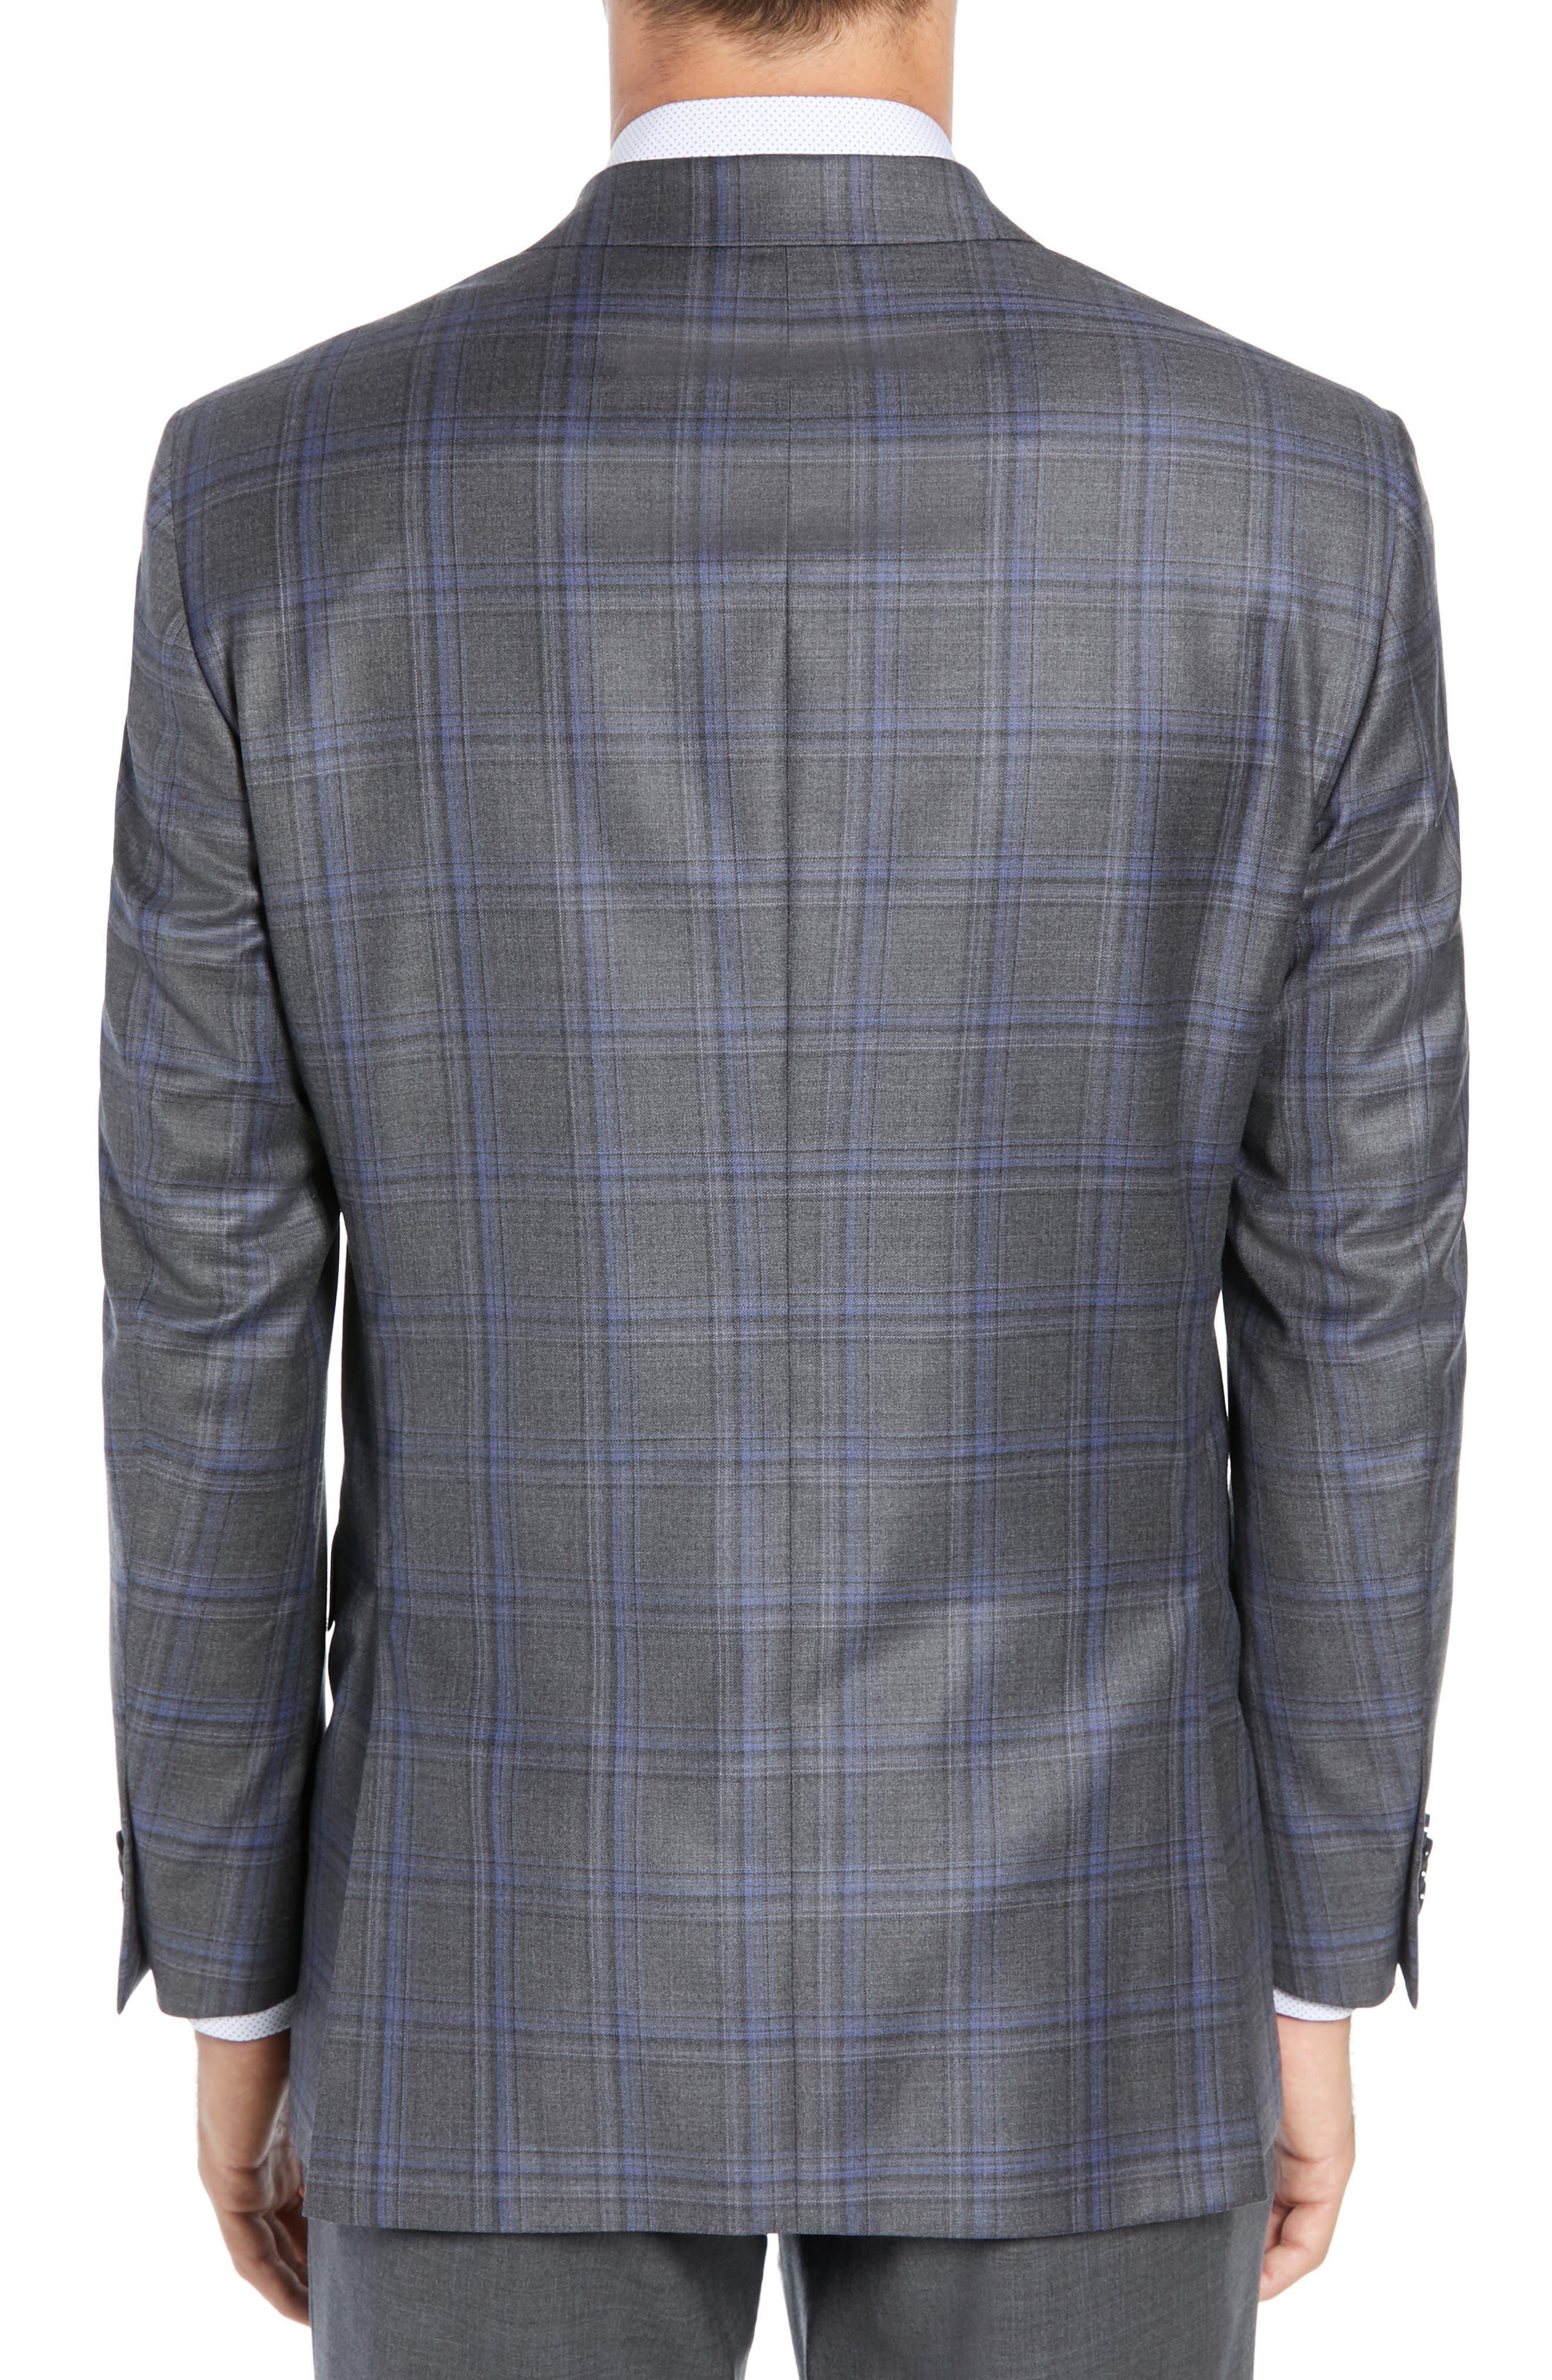 PETER MILLAR, Classic Fit Grey Plaid Sport Coat, Alternate thumbnail 2, color, GREY